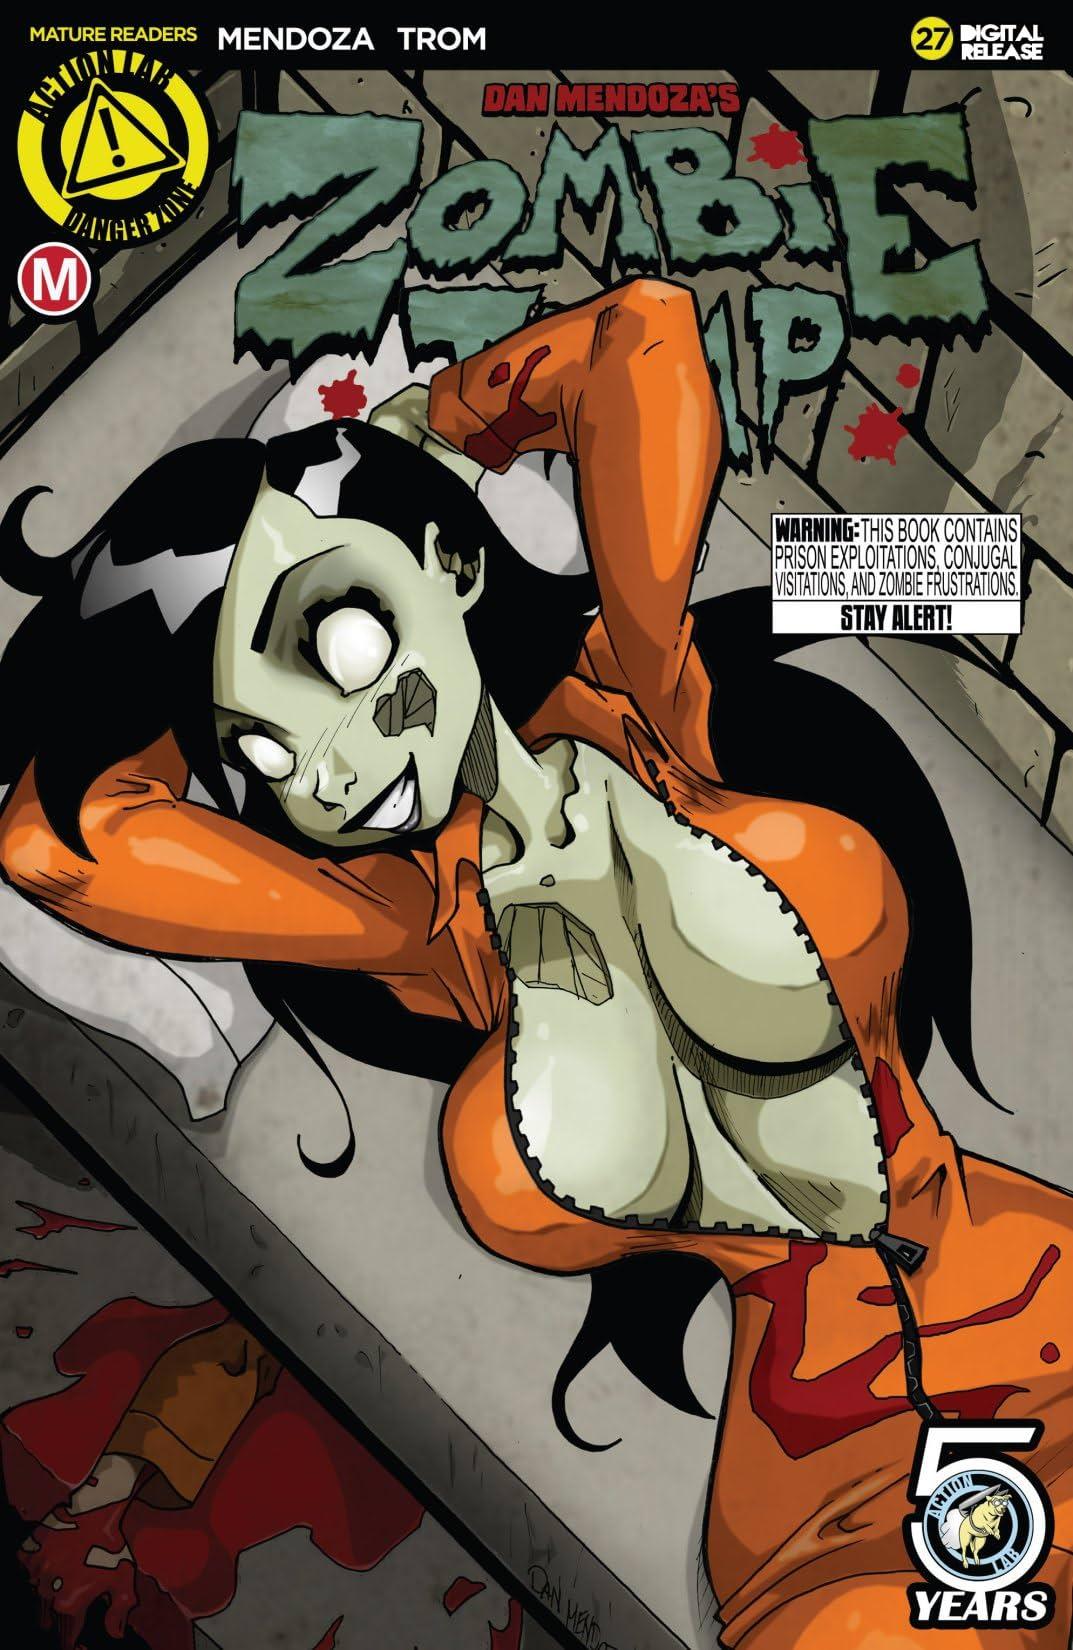 Zombie Tramp #27